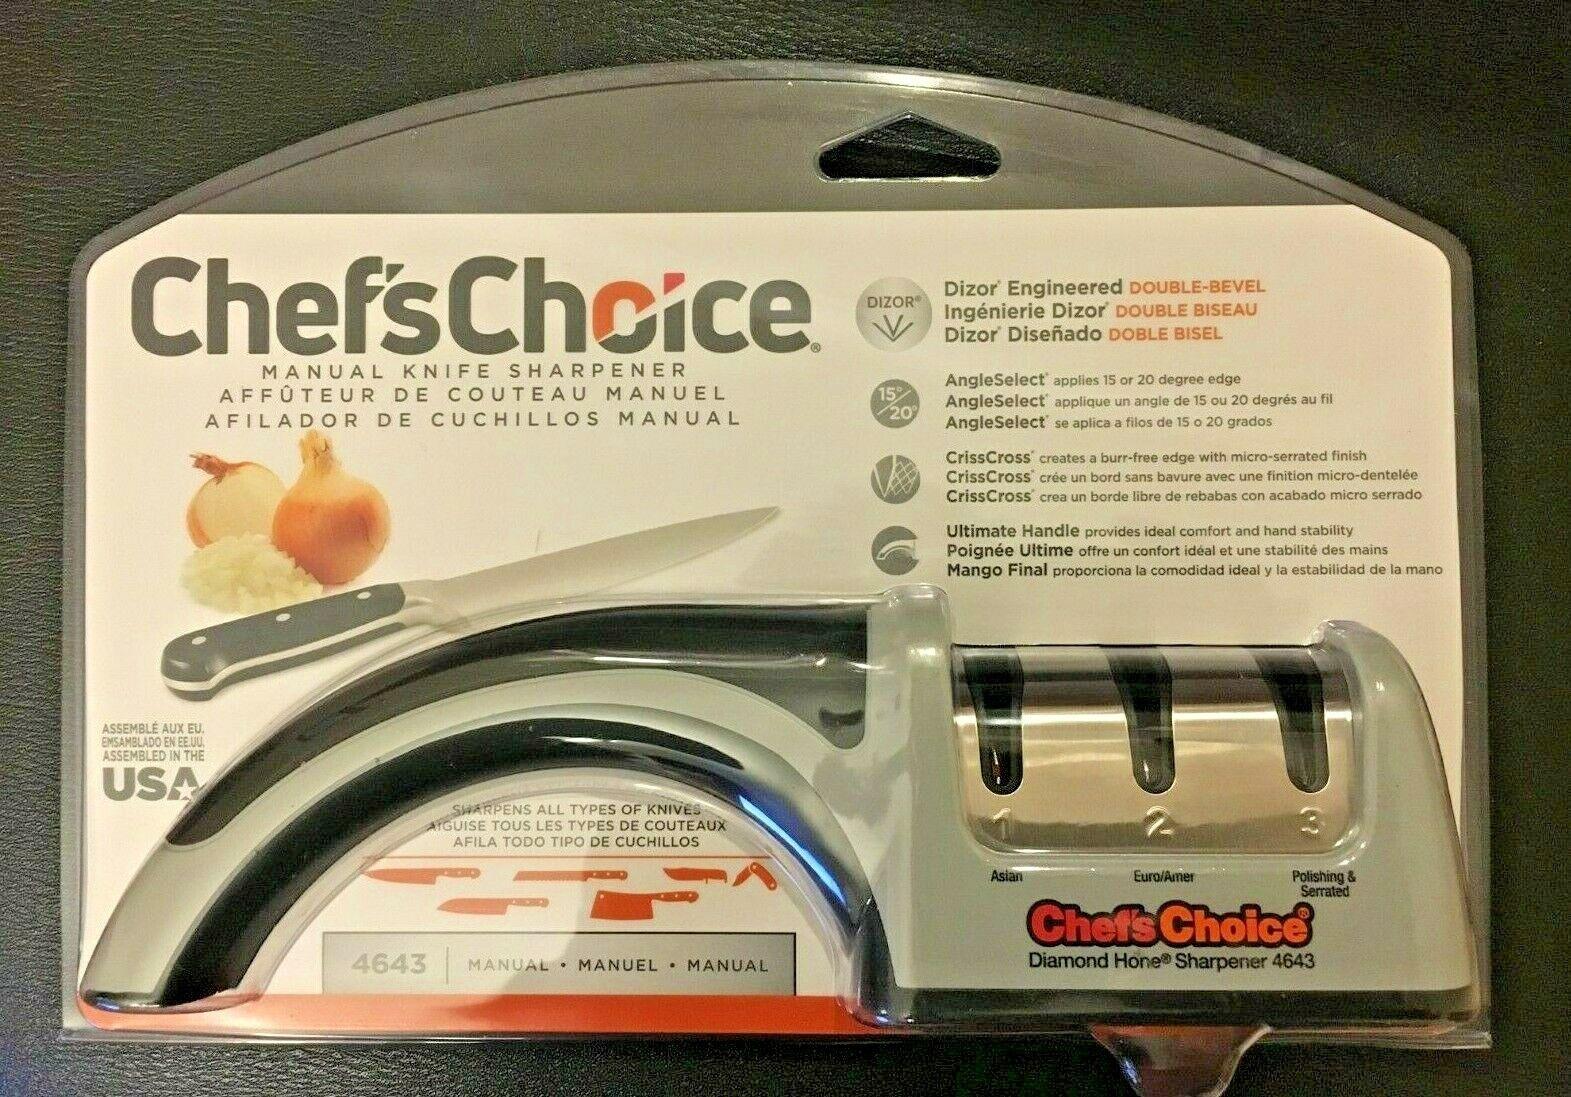 Chef'sChoice 4643 ProntoPro Diamond Hone Manual Knife Shar